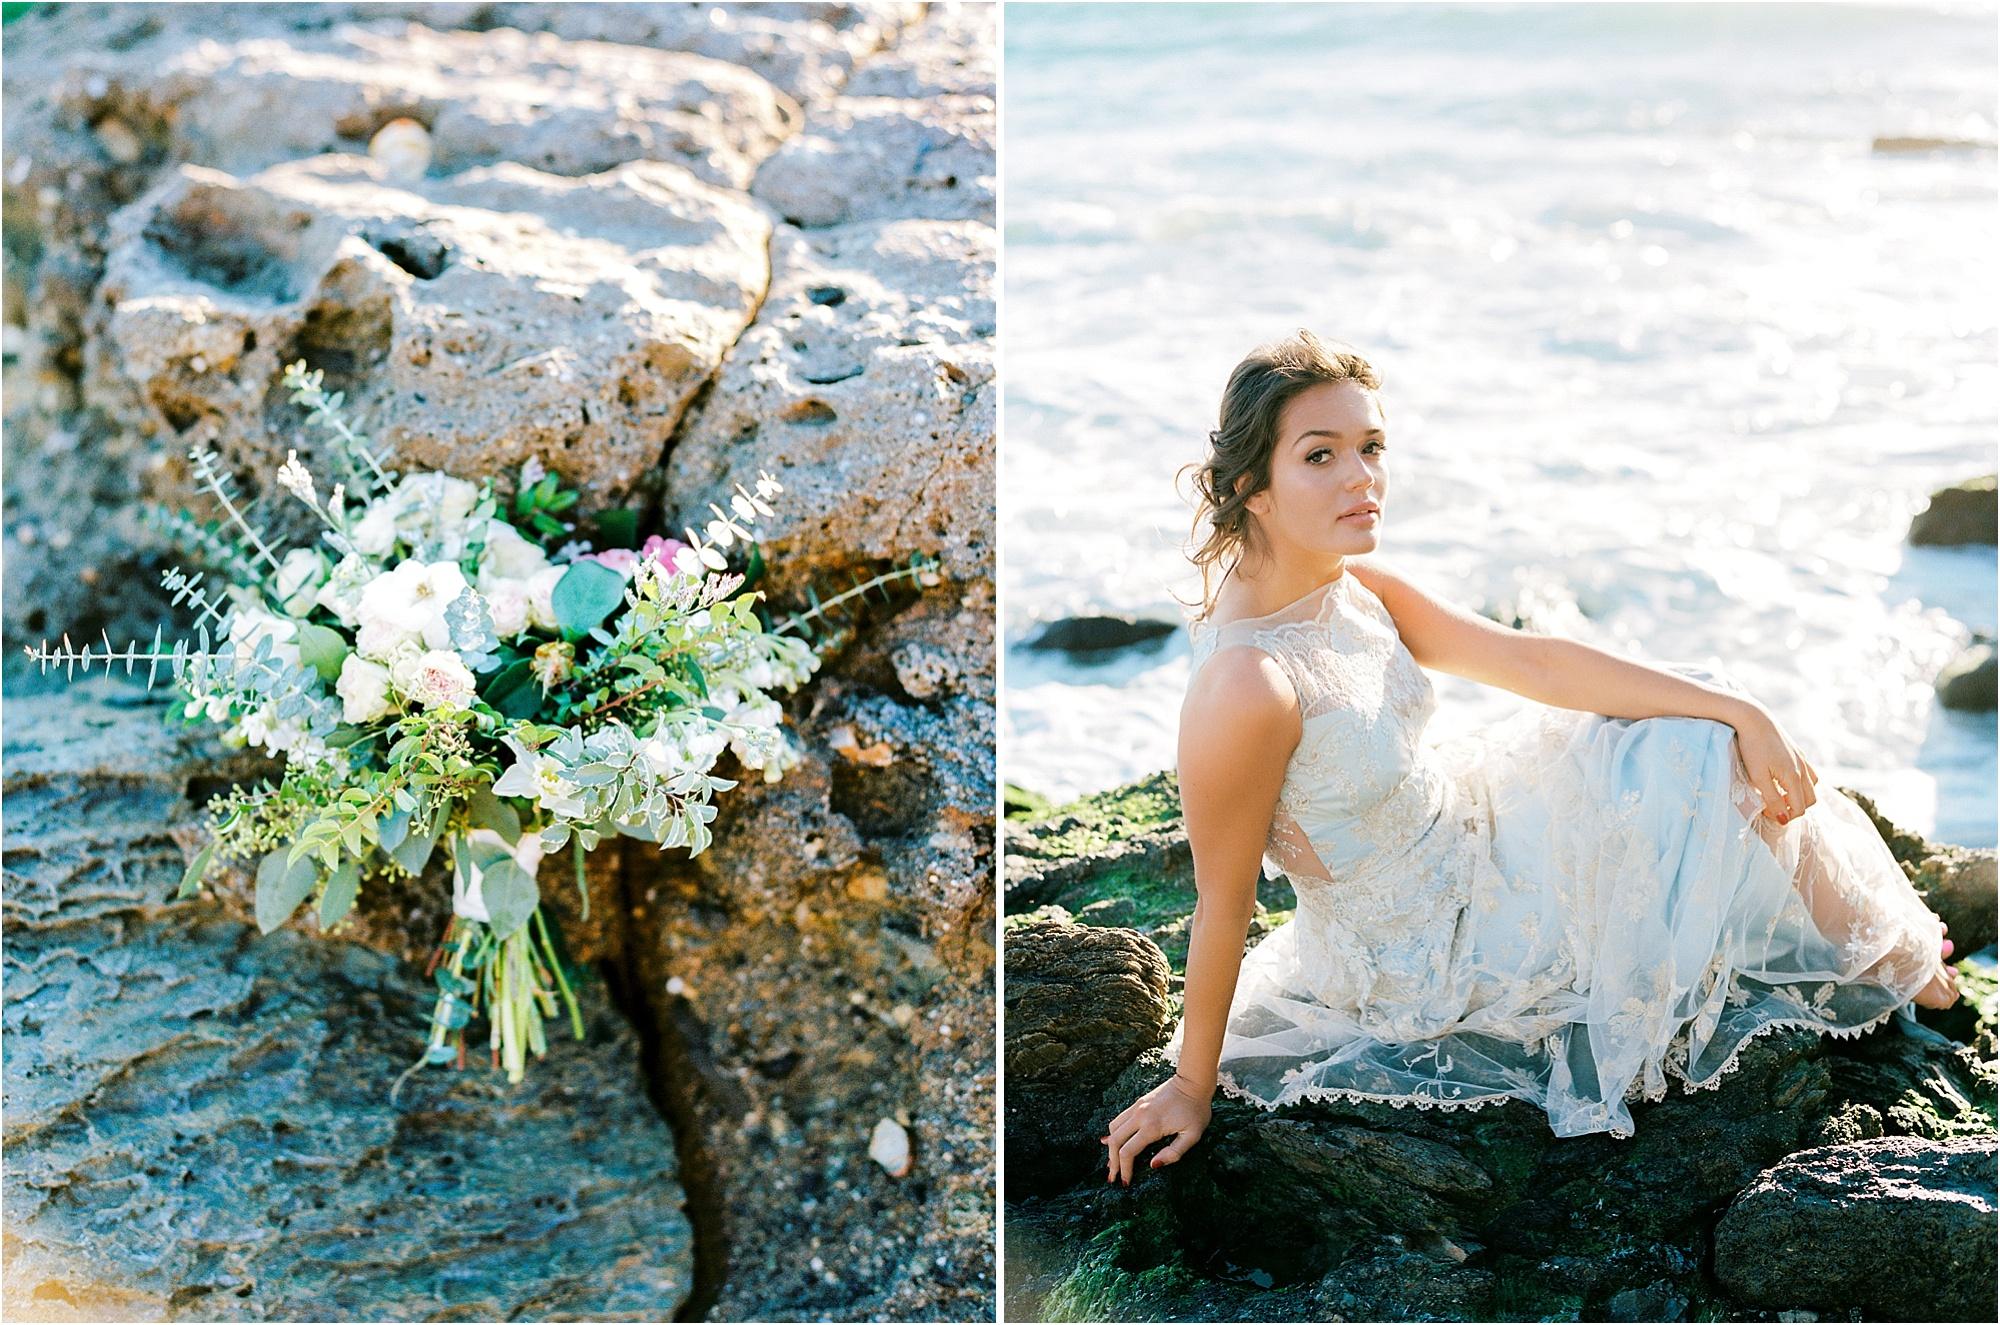 victoria-beach-wedding-inspiration-45.jpg